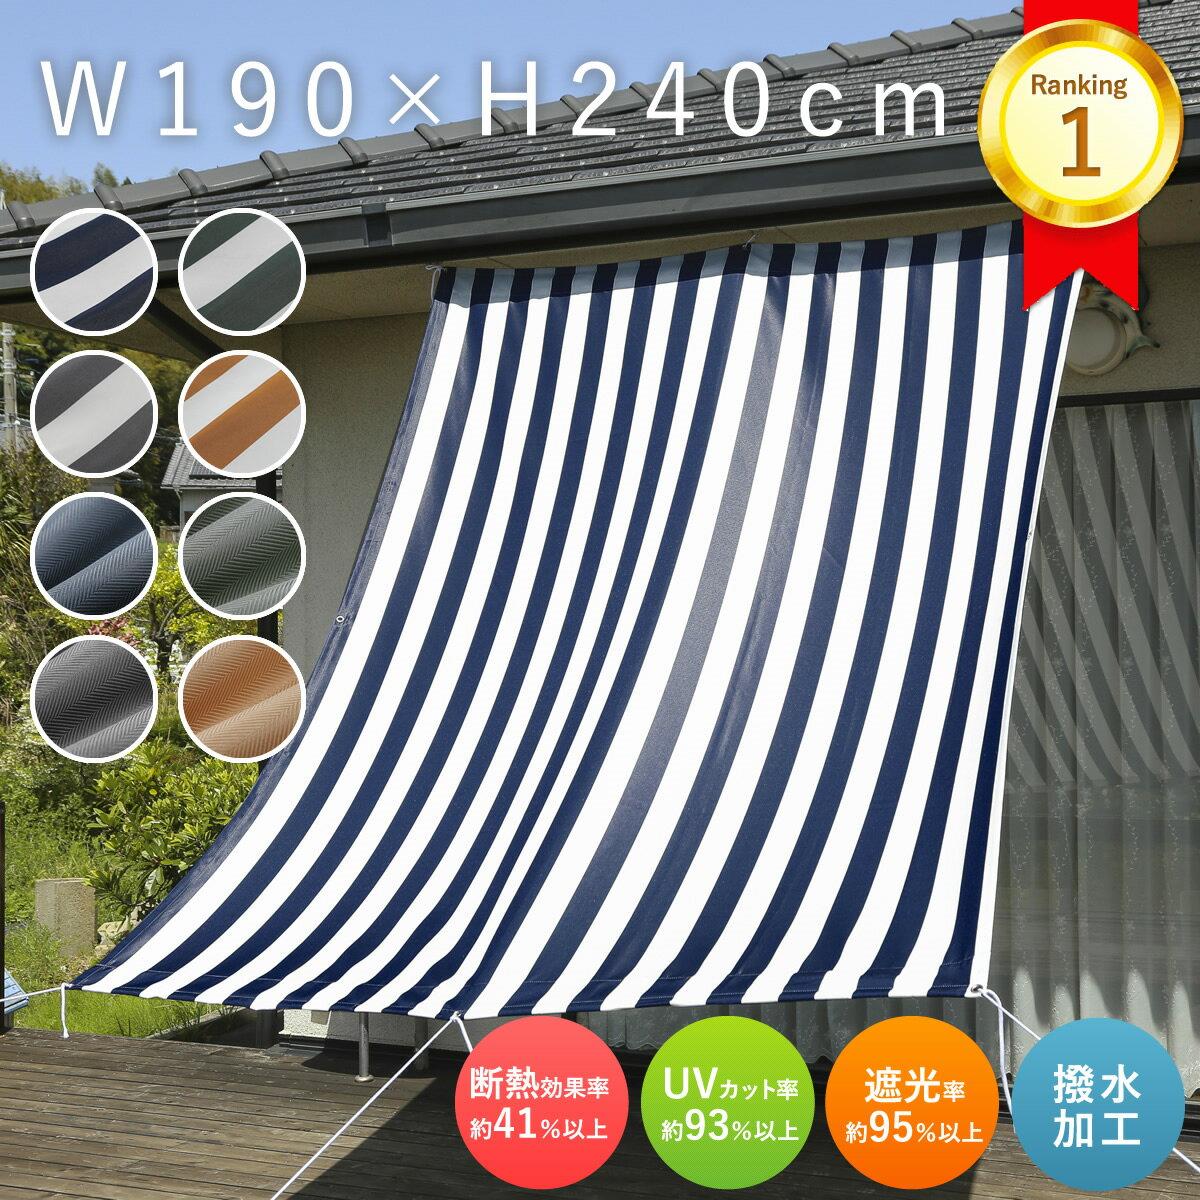 UV93%カット 日よけ サンシェード オーニング(サイズ:幅190×丈240cm)1枚*撥水 UVカット 紫外線 遮光 取付ヒモ付属 日除け 雨よけ シェード テント 洋風たてす